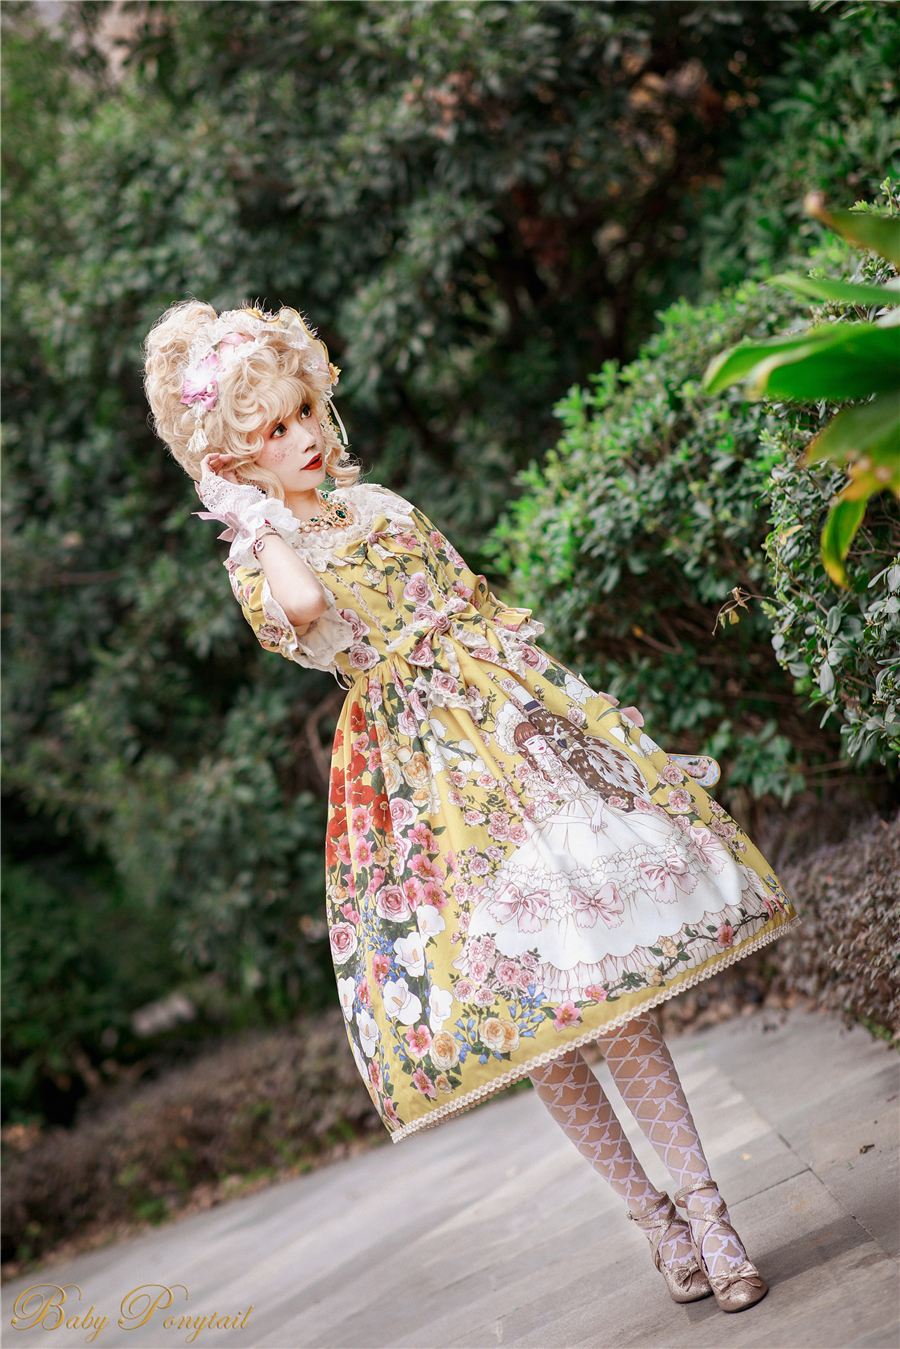 Baby Ponytail_Model Photo_Polly's Garden of Dreams_OP Yellow_Kaka_26.jpg